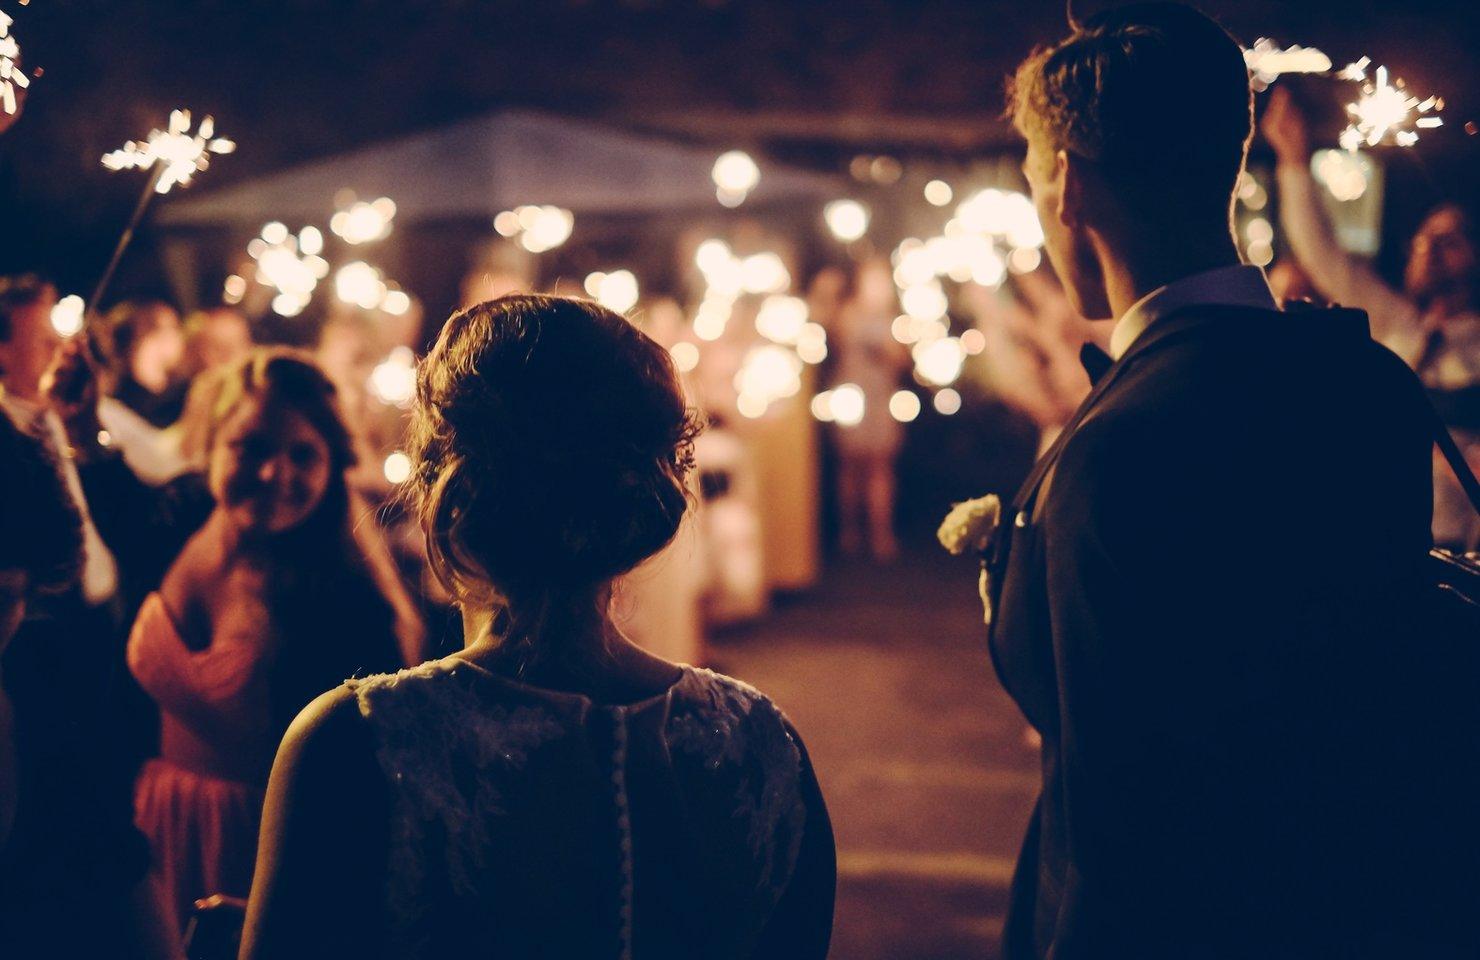 rsz_person-people-celebration-love-decoration-couple-695867-pxherecom